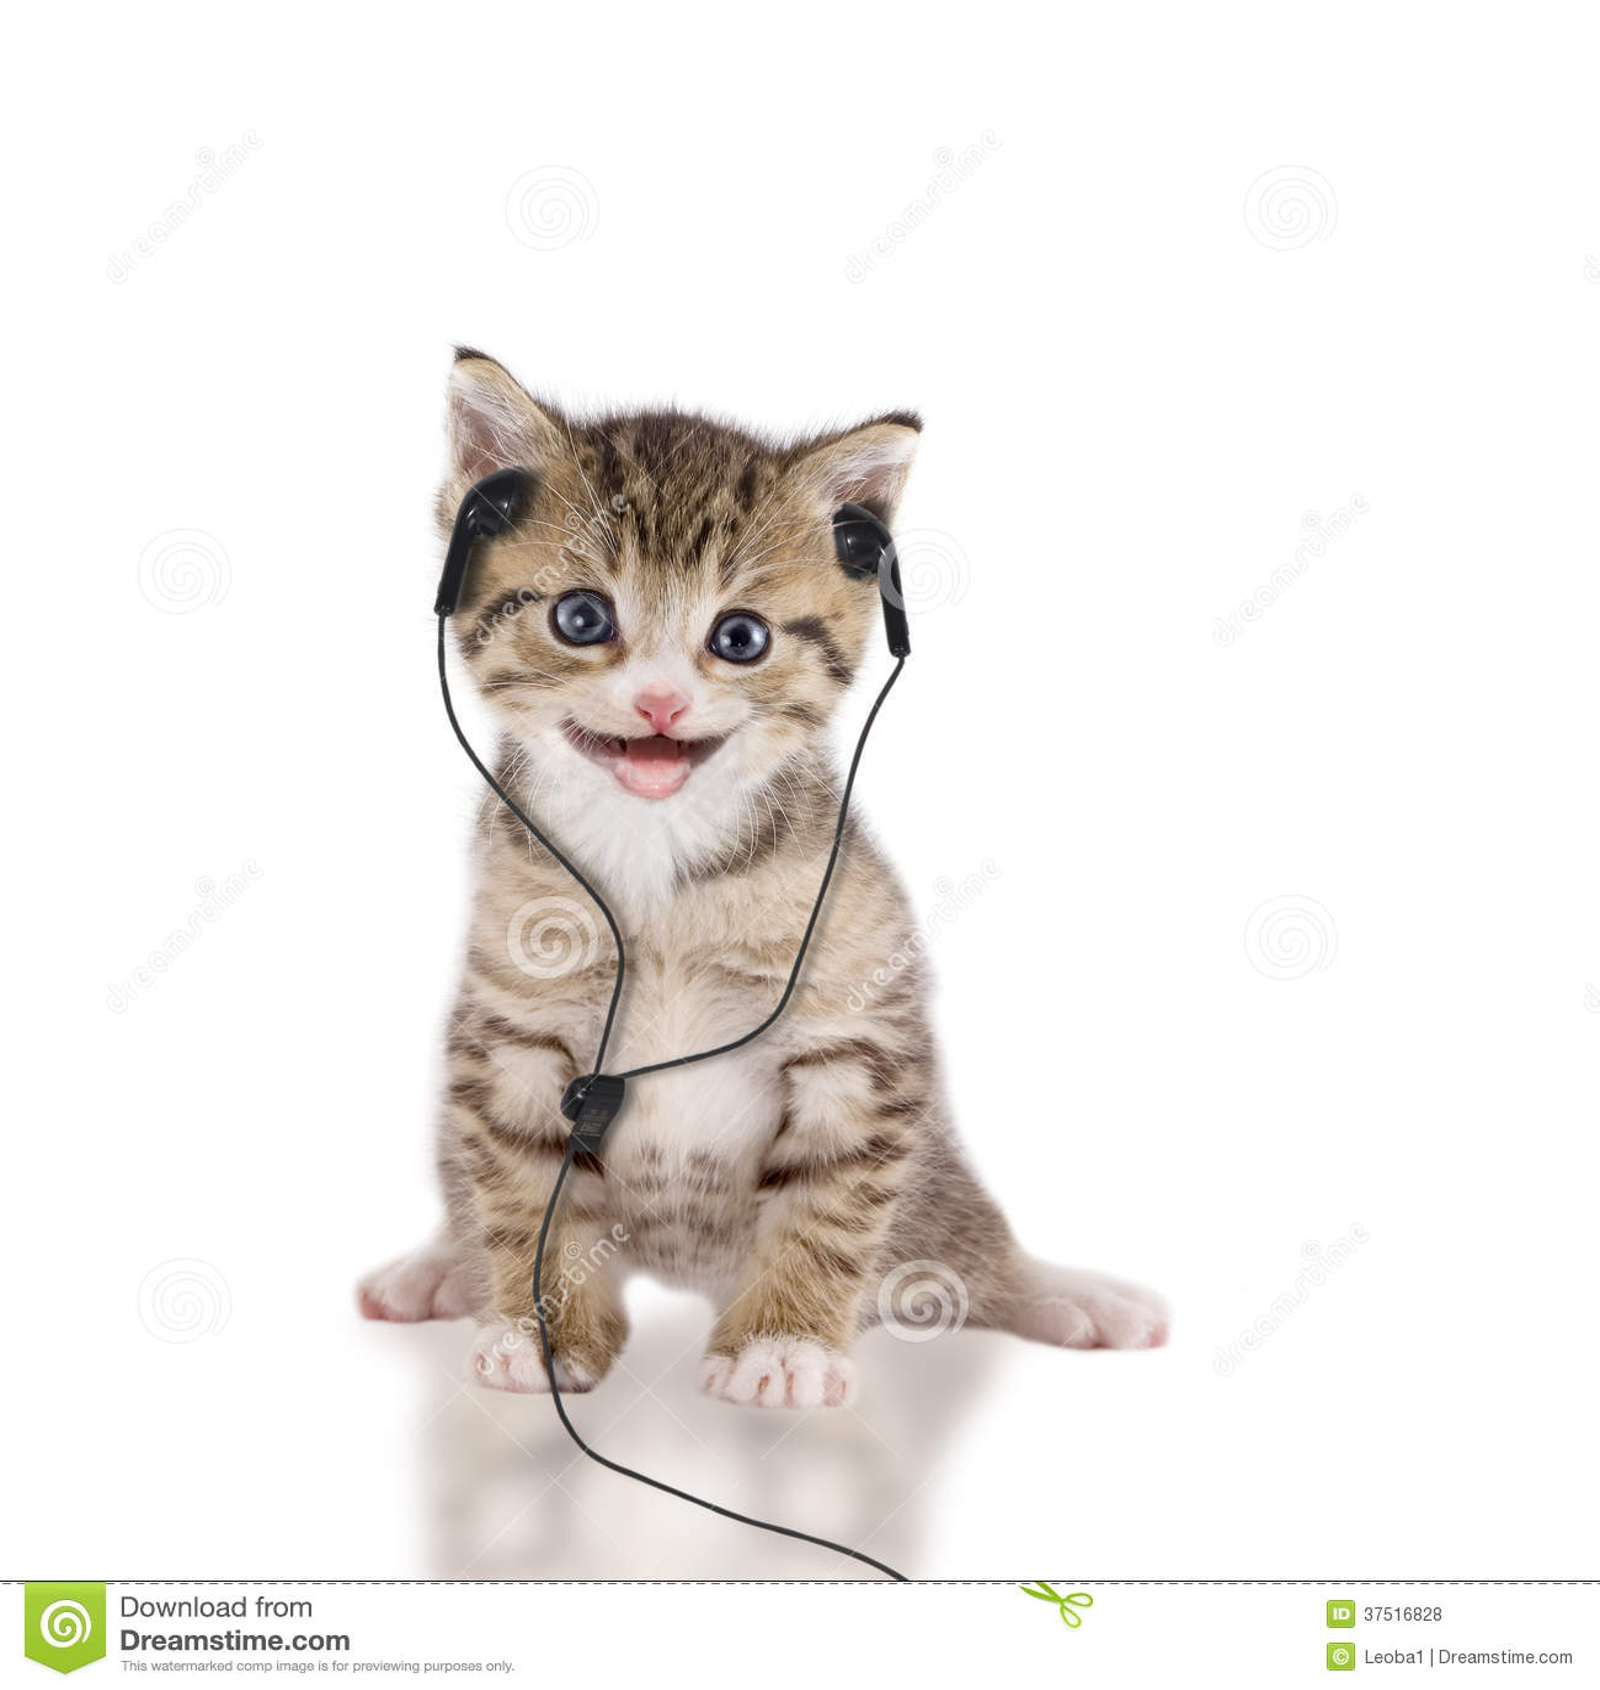 Cats With Headphones Gif